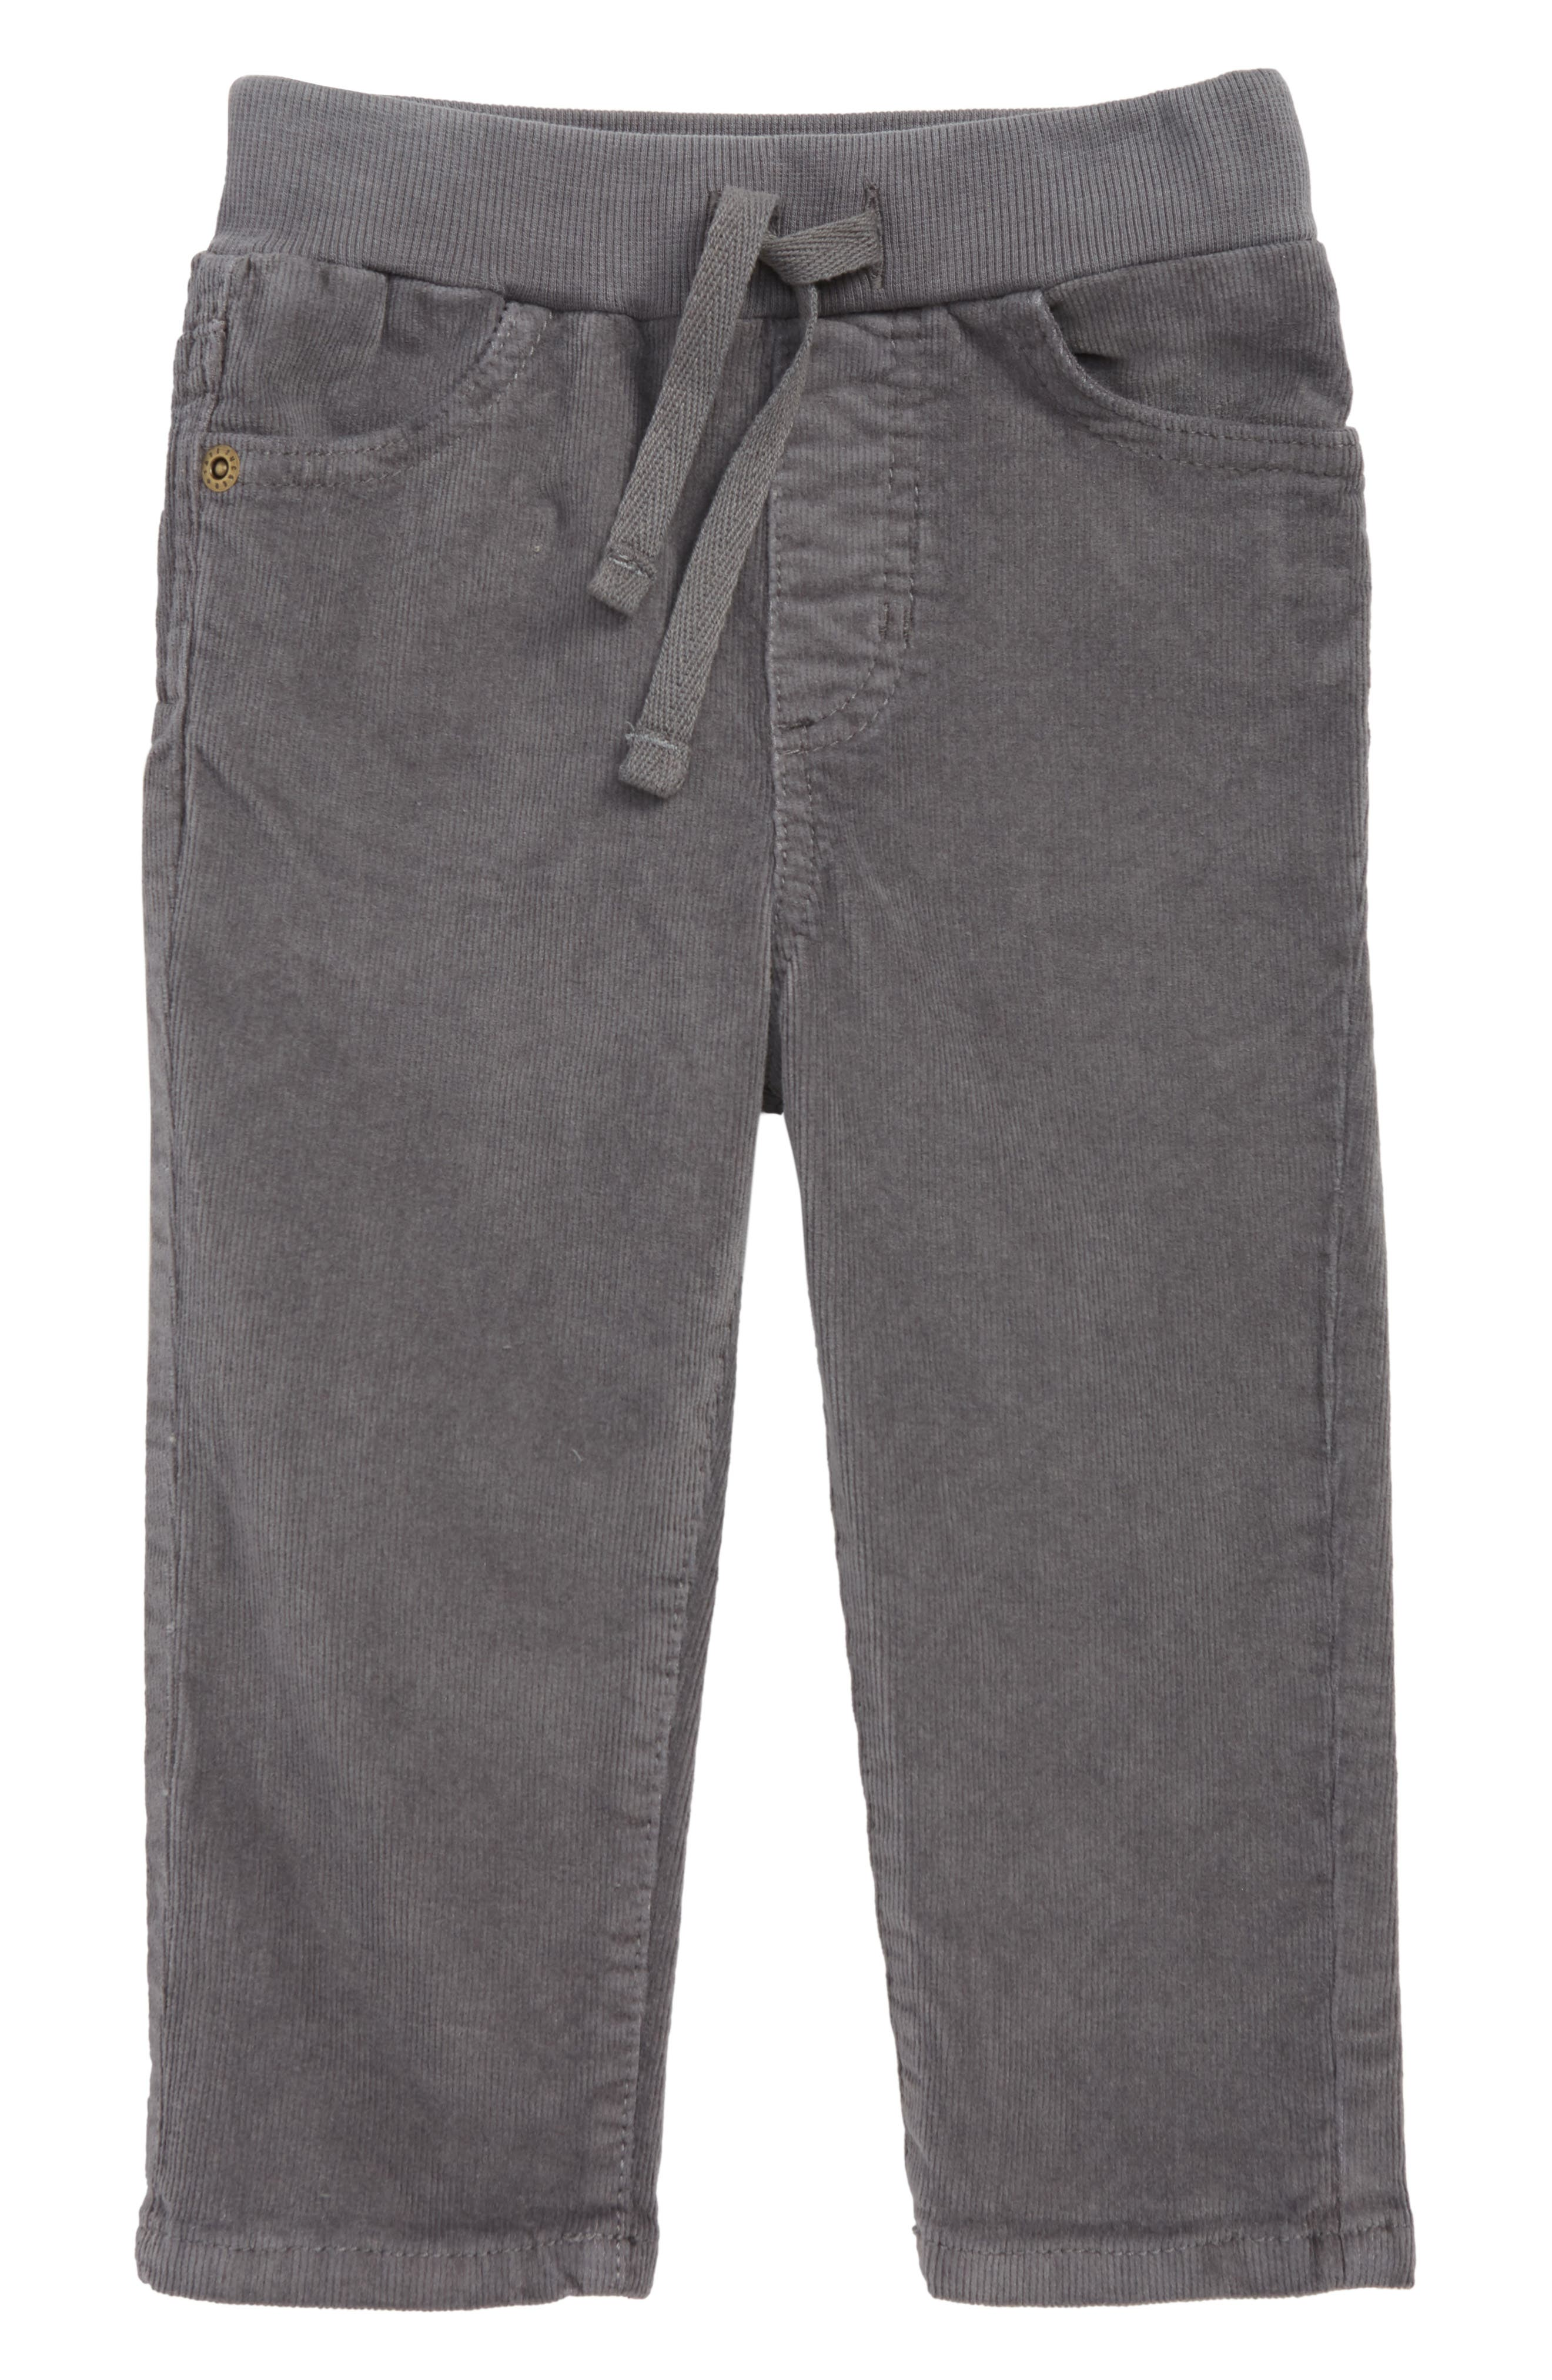 TUCKER + TATE Corduroy Pants, Main, color, GREY CASTLEROCK